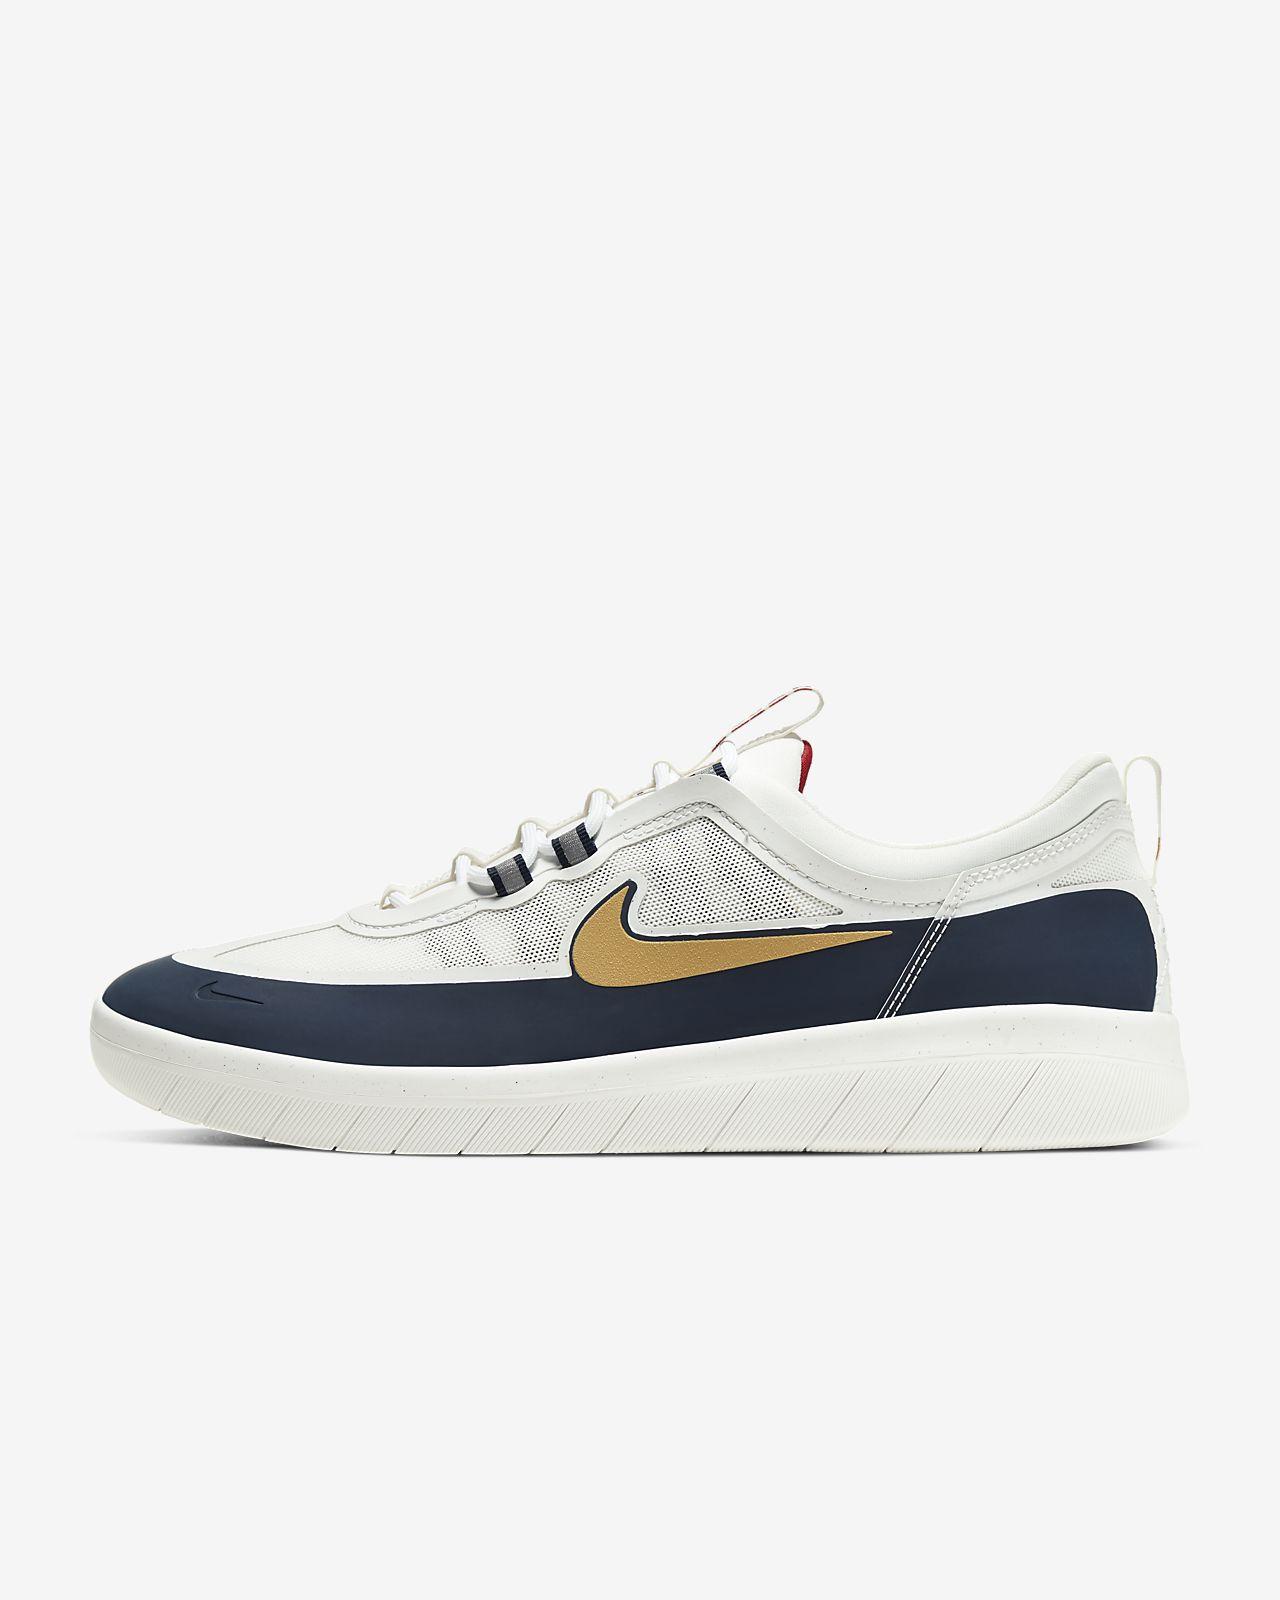 Buy Nike Nyjah Free 2.0 Skate Shoes